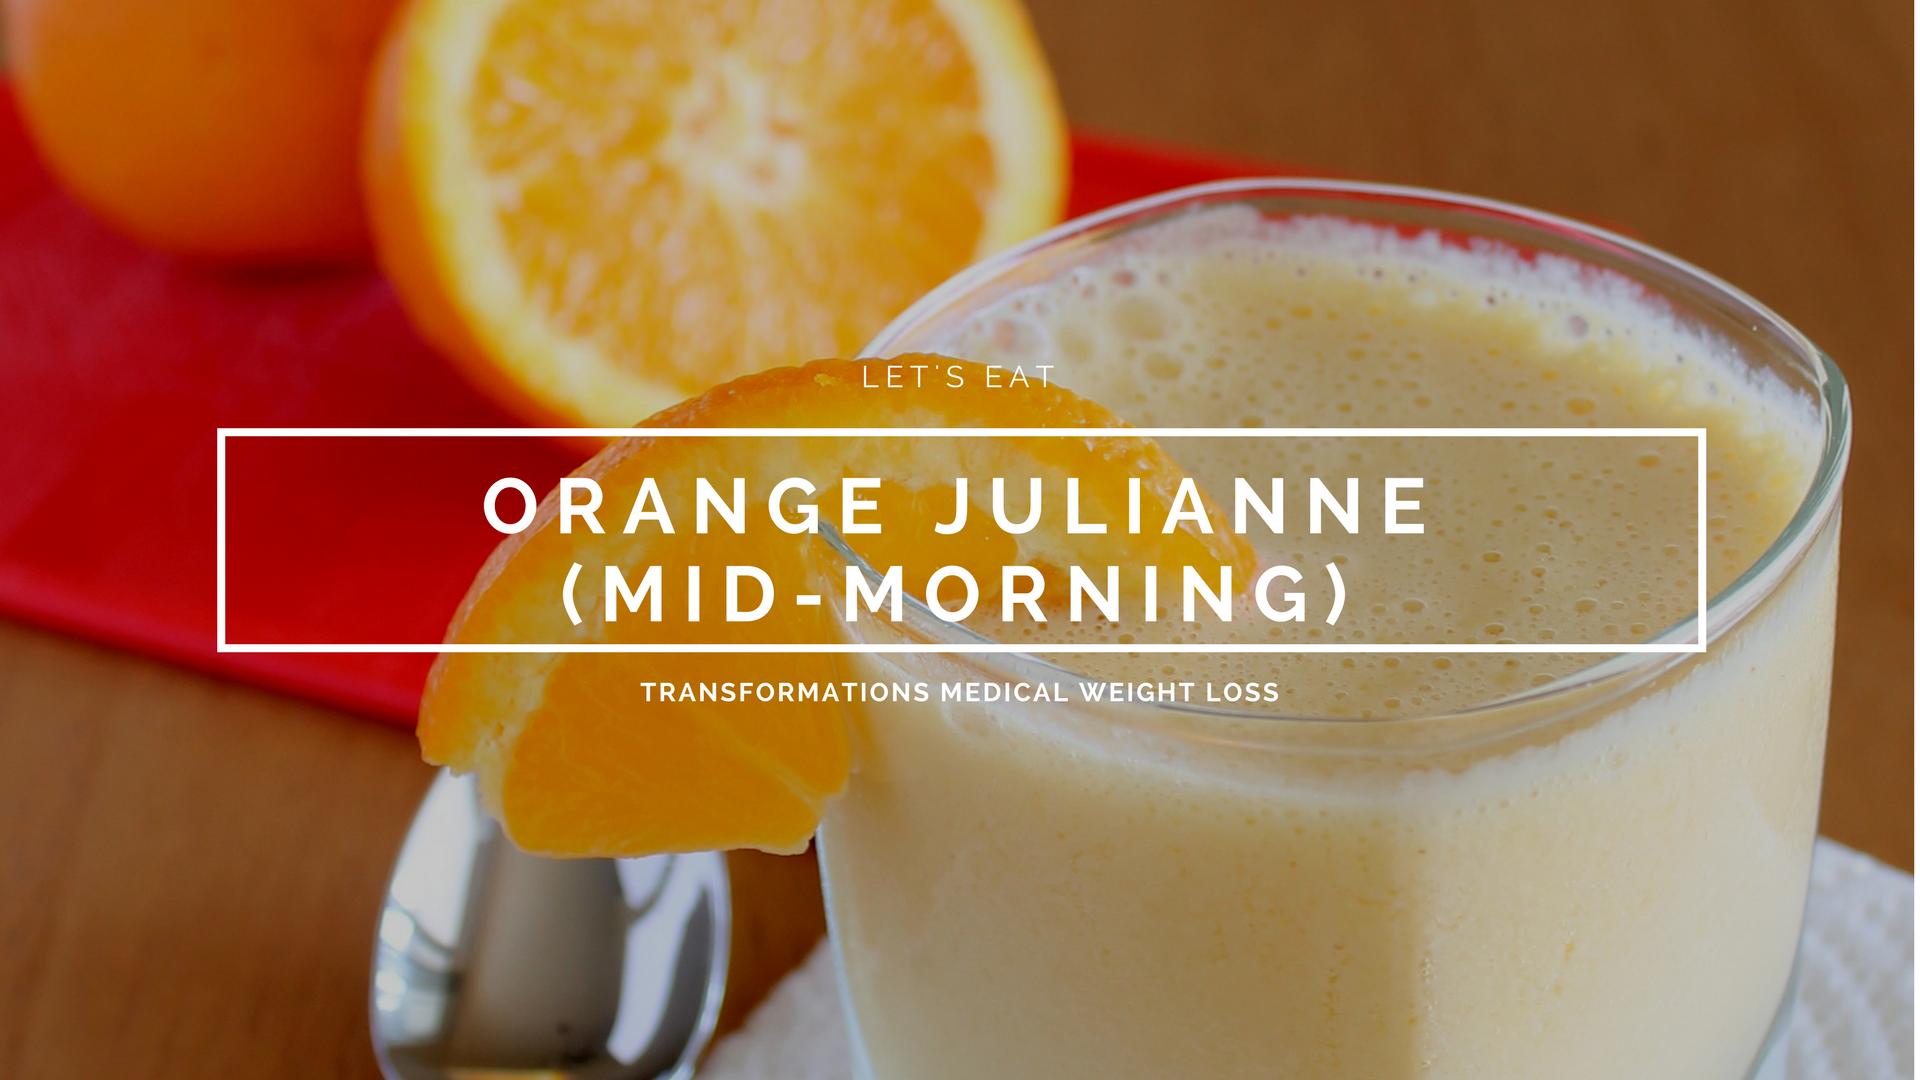 Orange Julianne (Mid-Morning Snack)